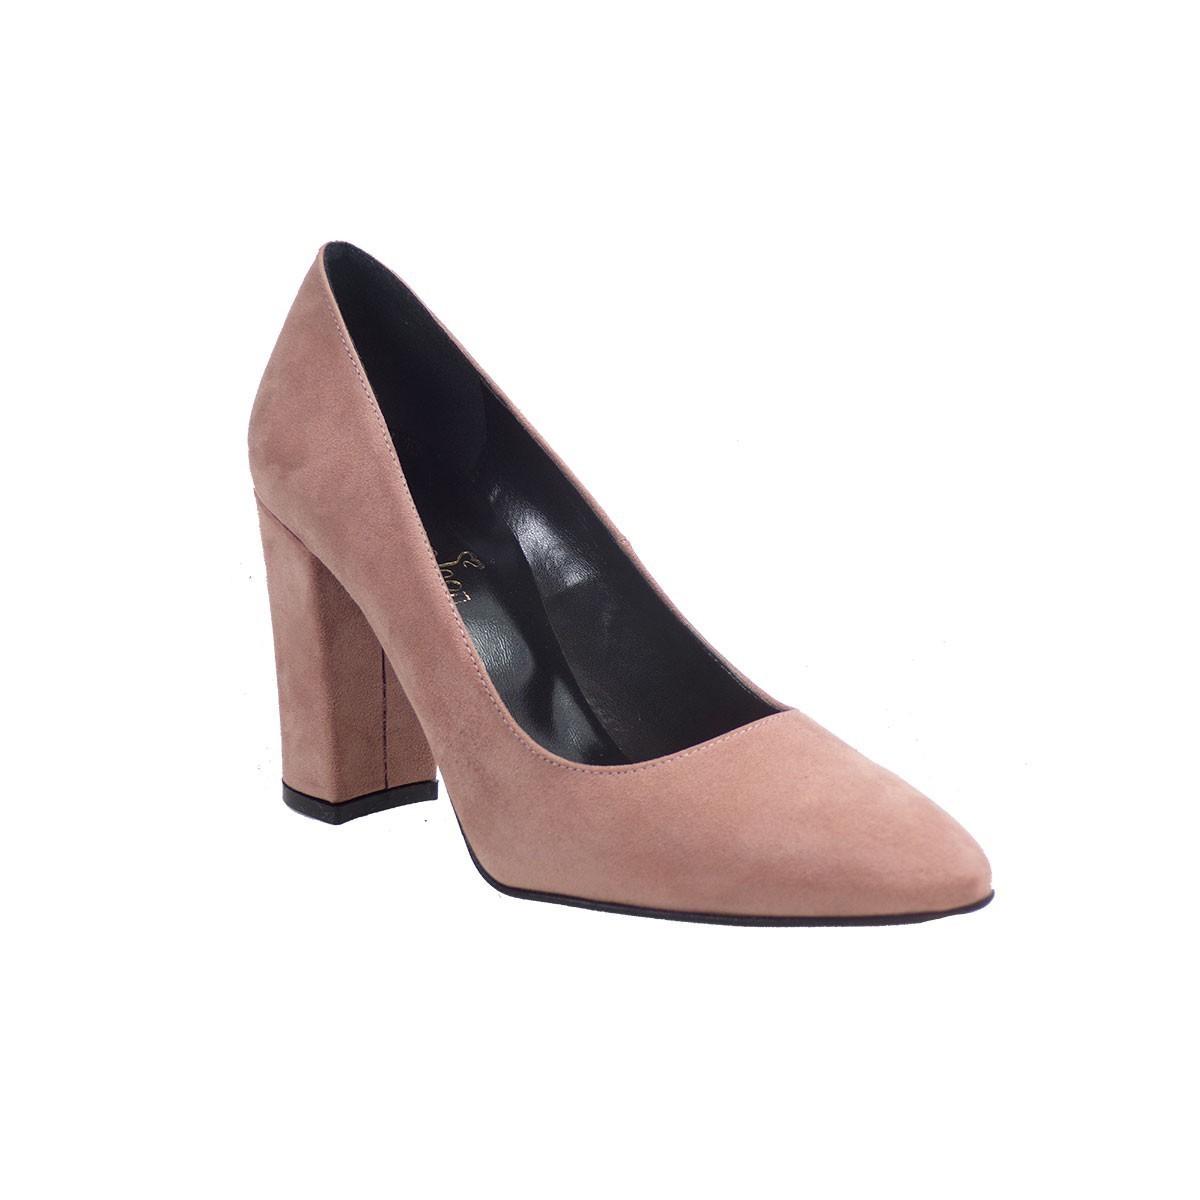 Fashion Icon Γυναικεία Παπούτσια Γόβα f09-06532 Nude